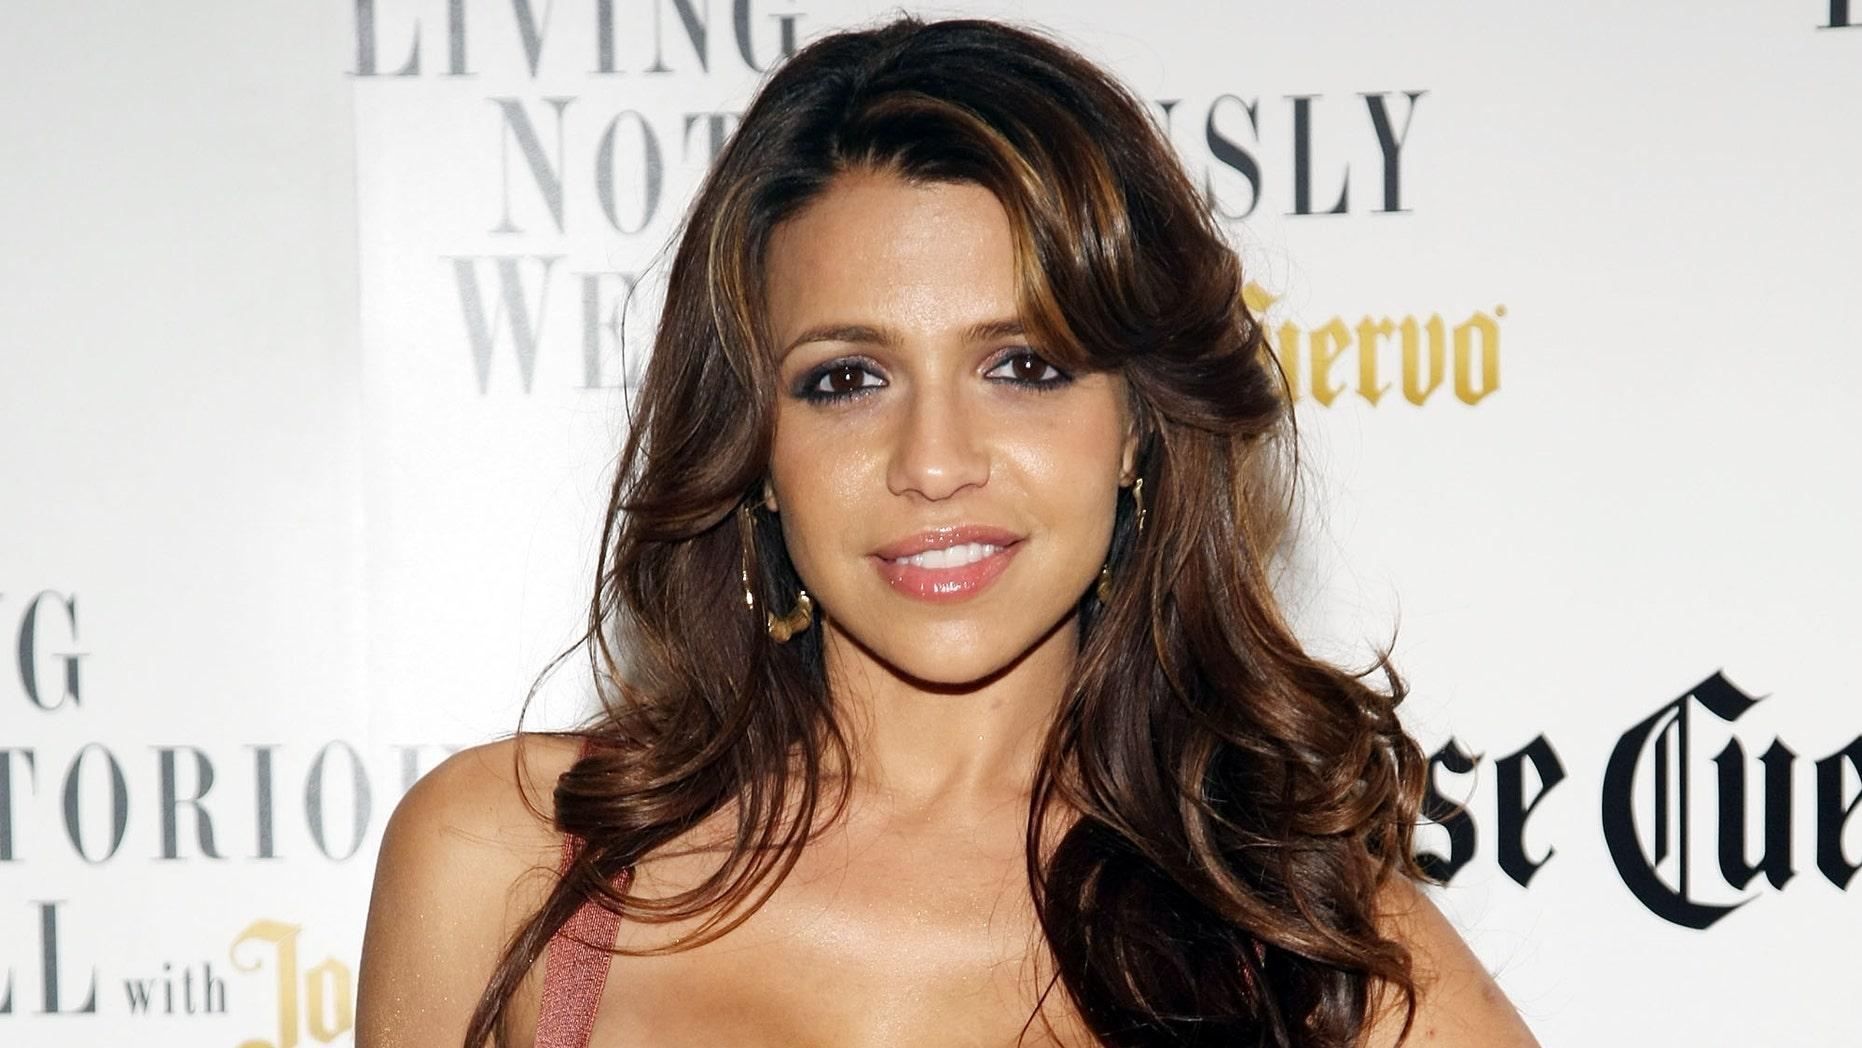 Playboy model Vida Guerra in a March 9, 2009 file photo.